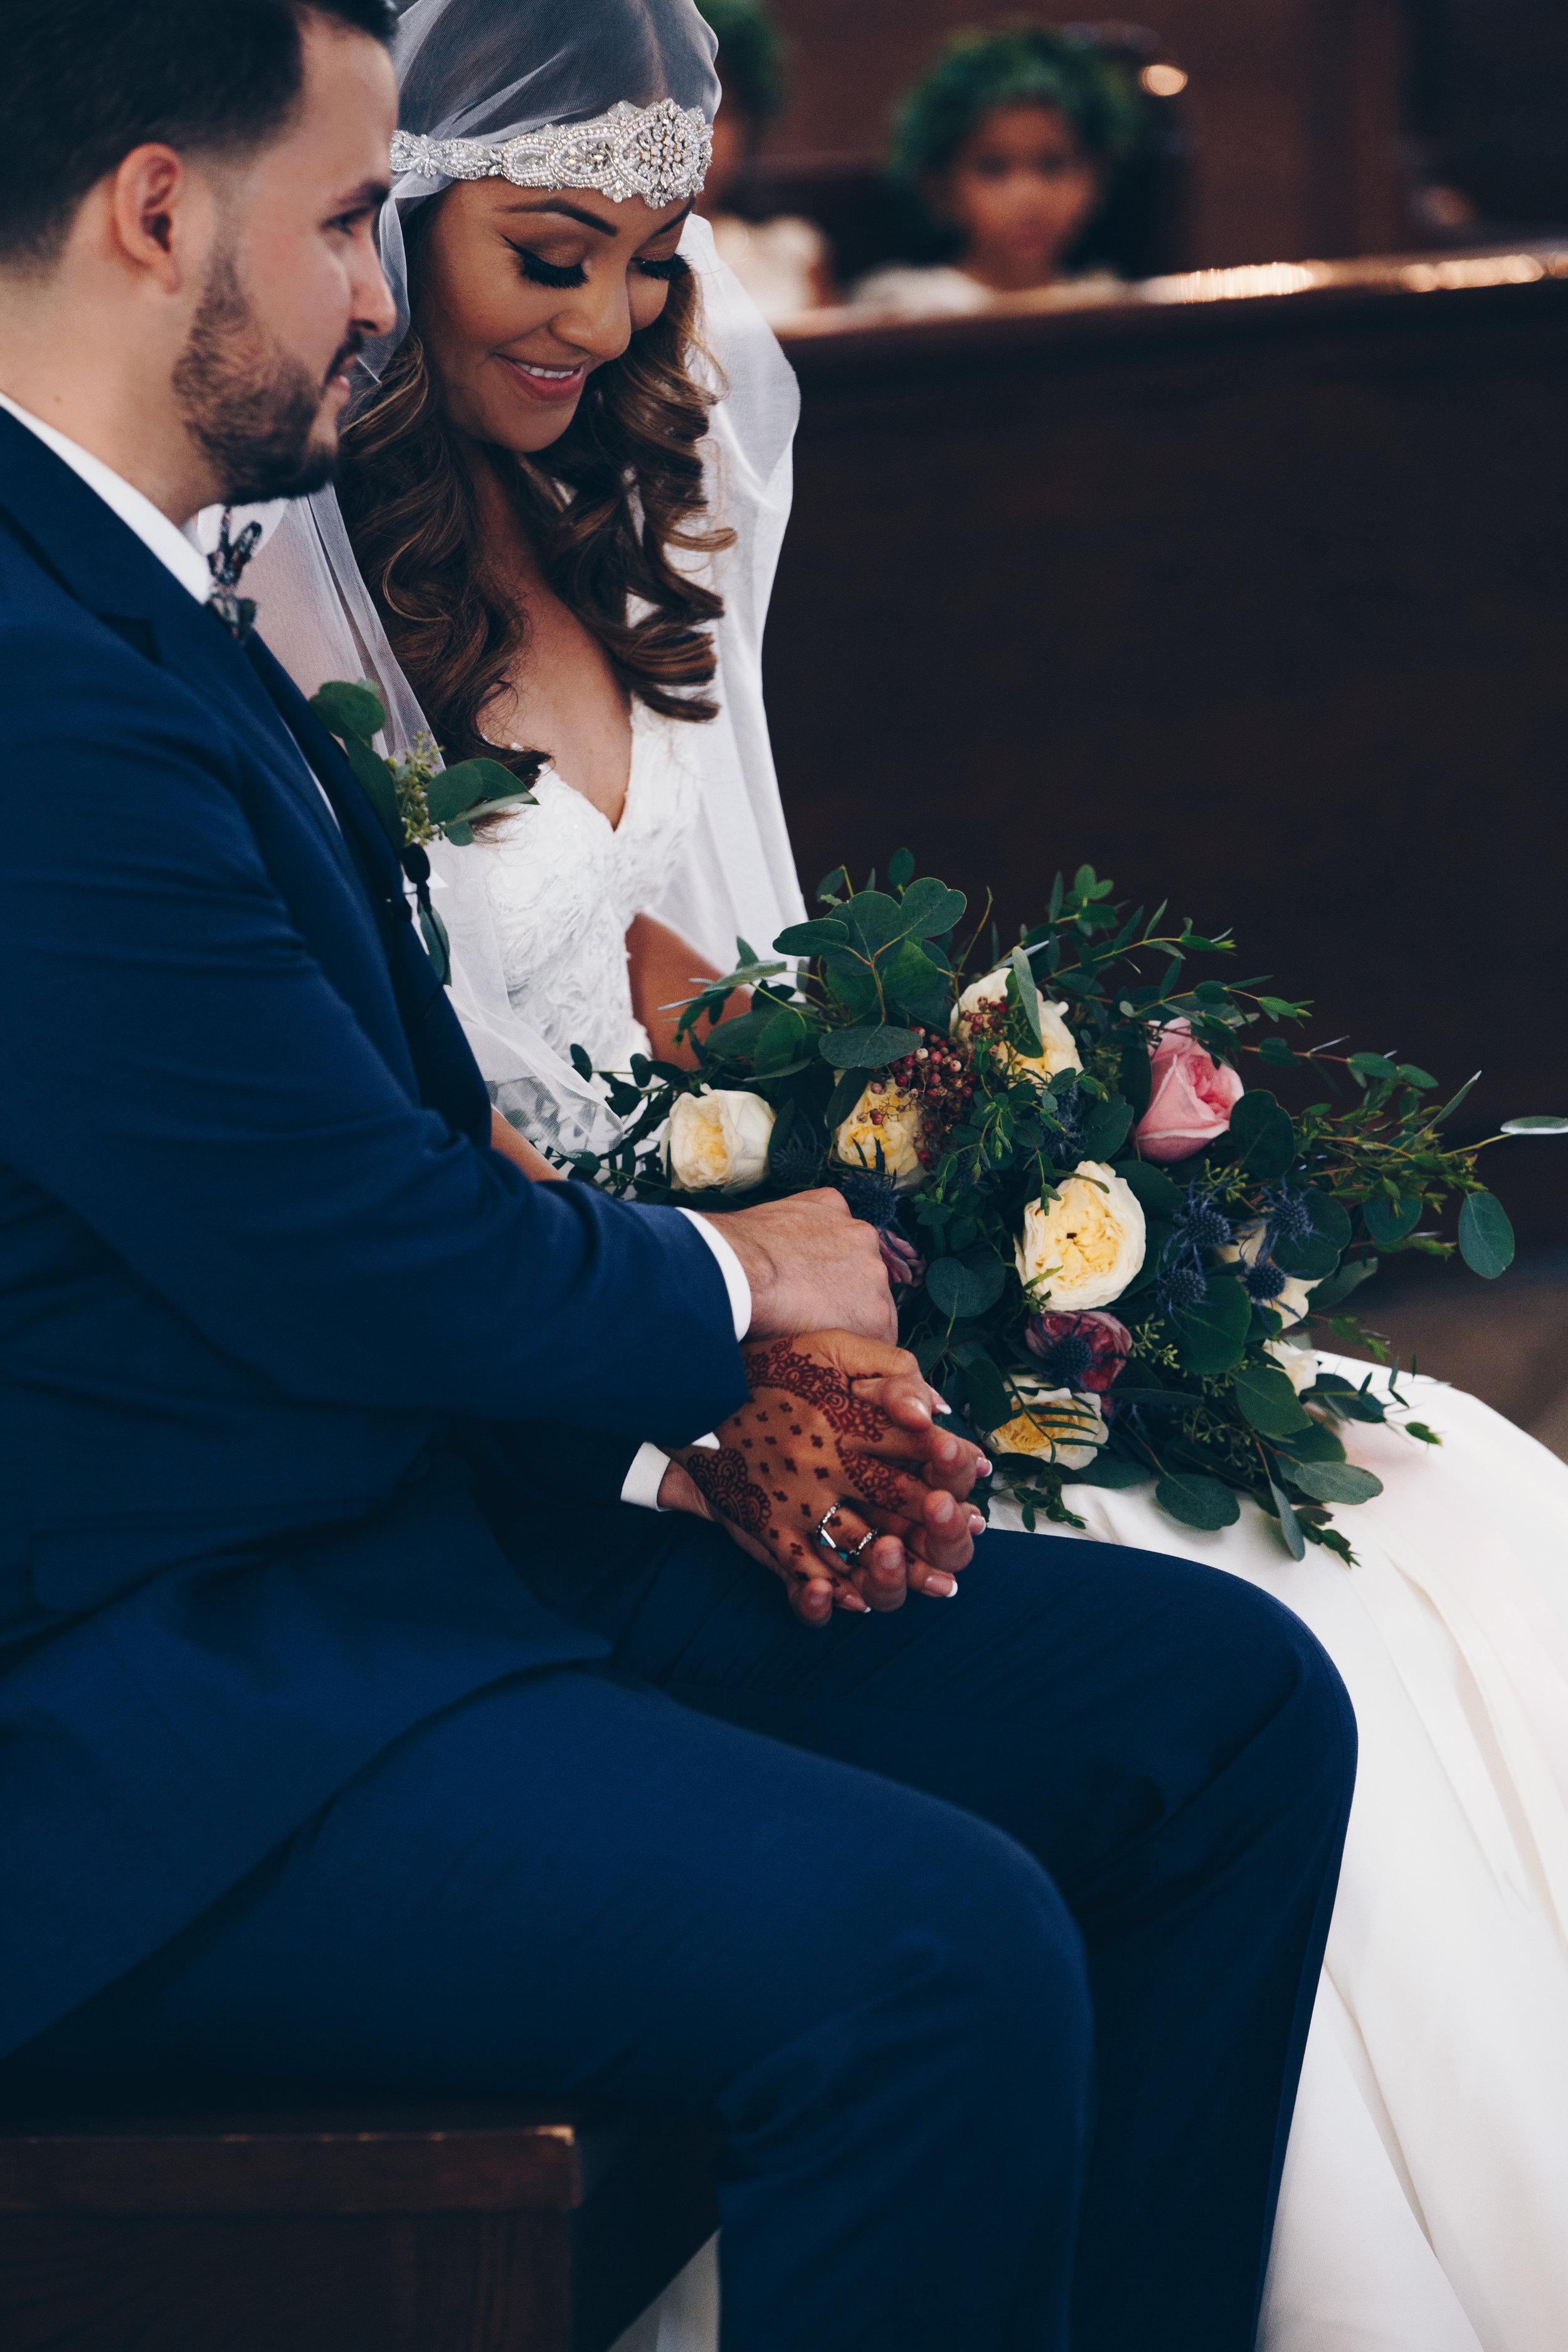 Veronica & Adrian Wedding 11 (1 of 1).jpg